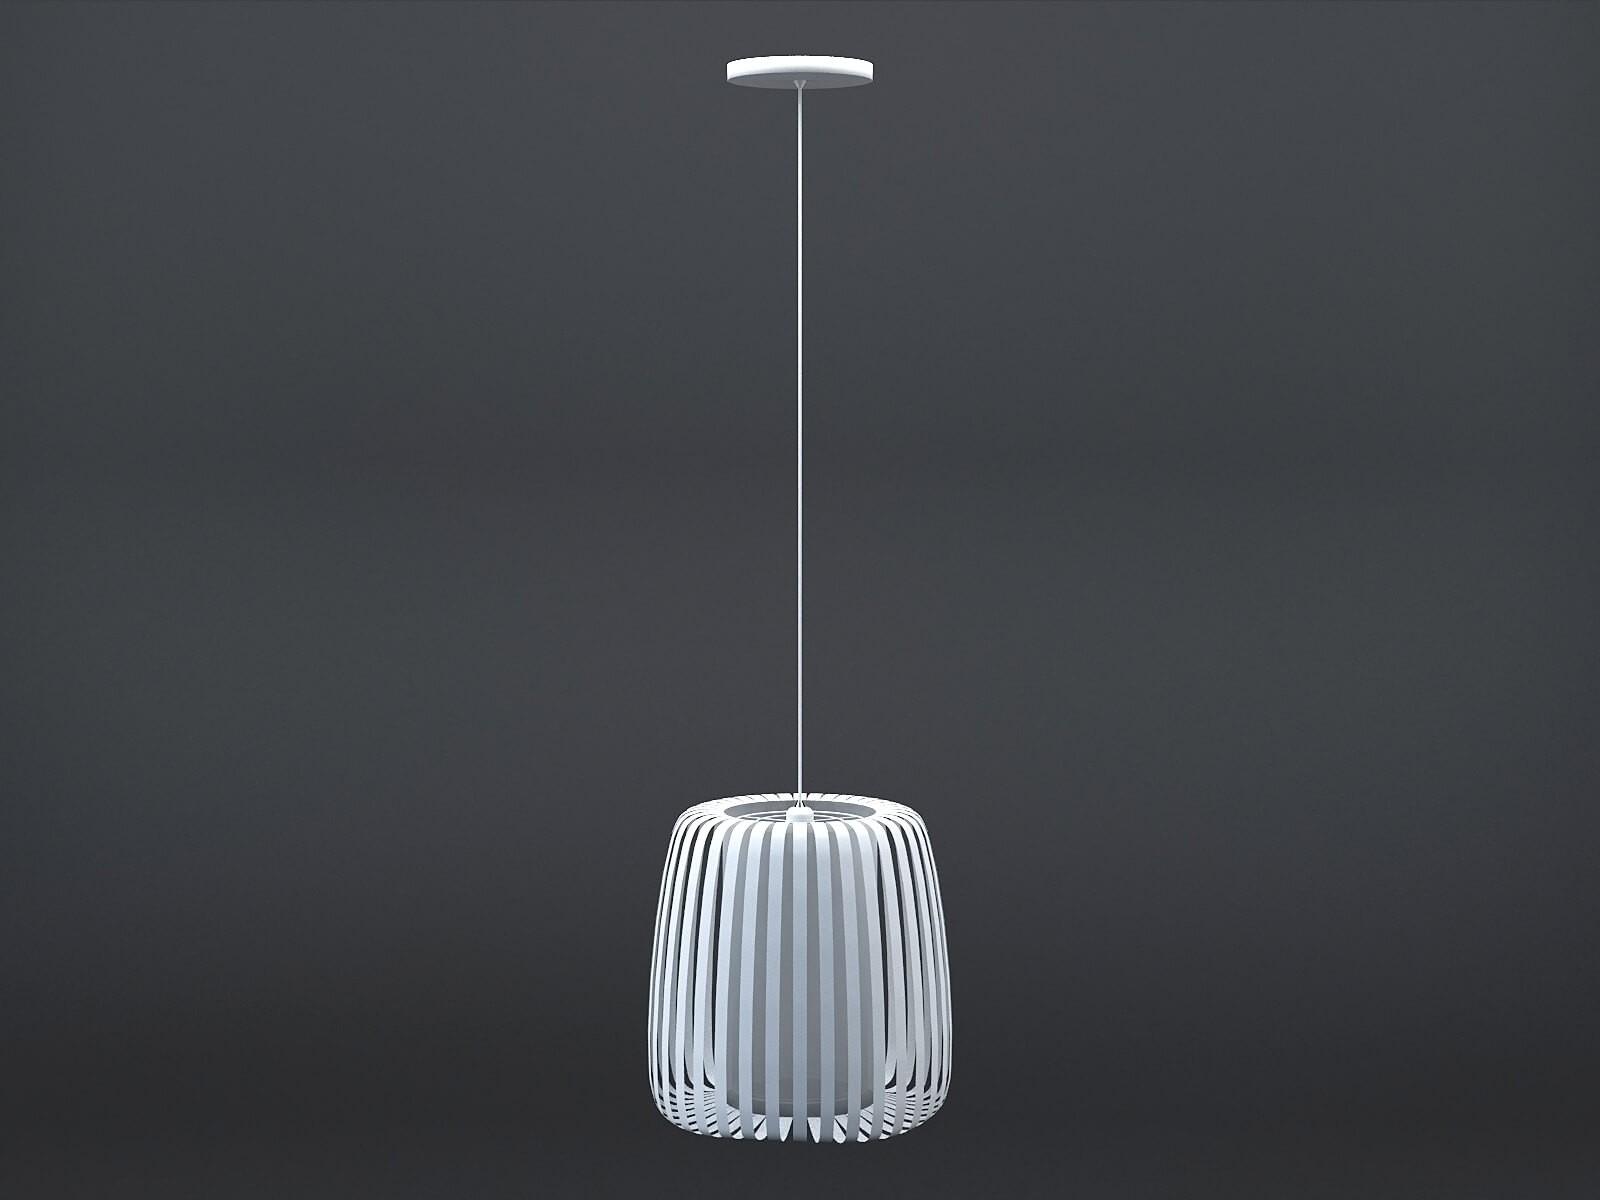 Lampe suspension Polly blanc